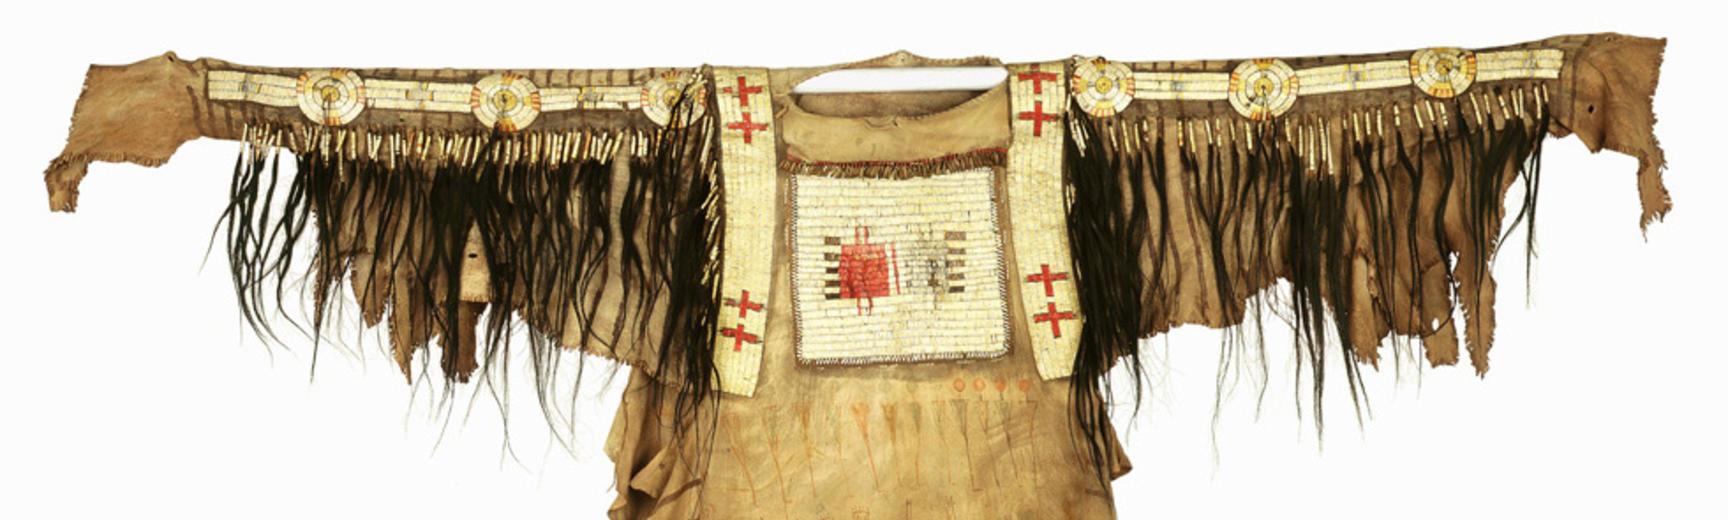 Native American header image